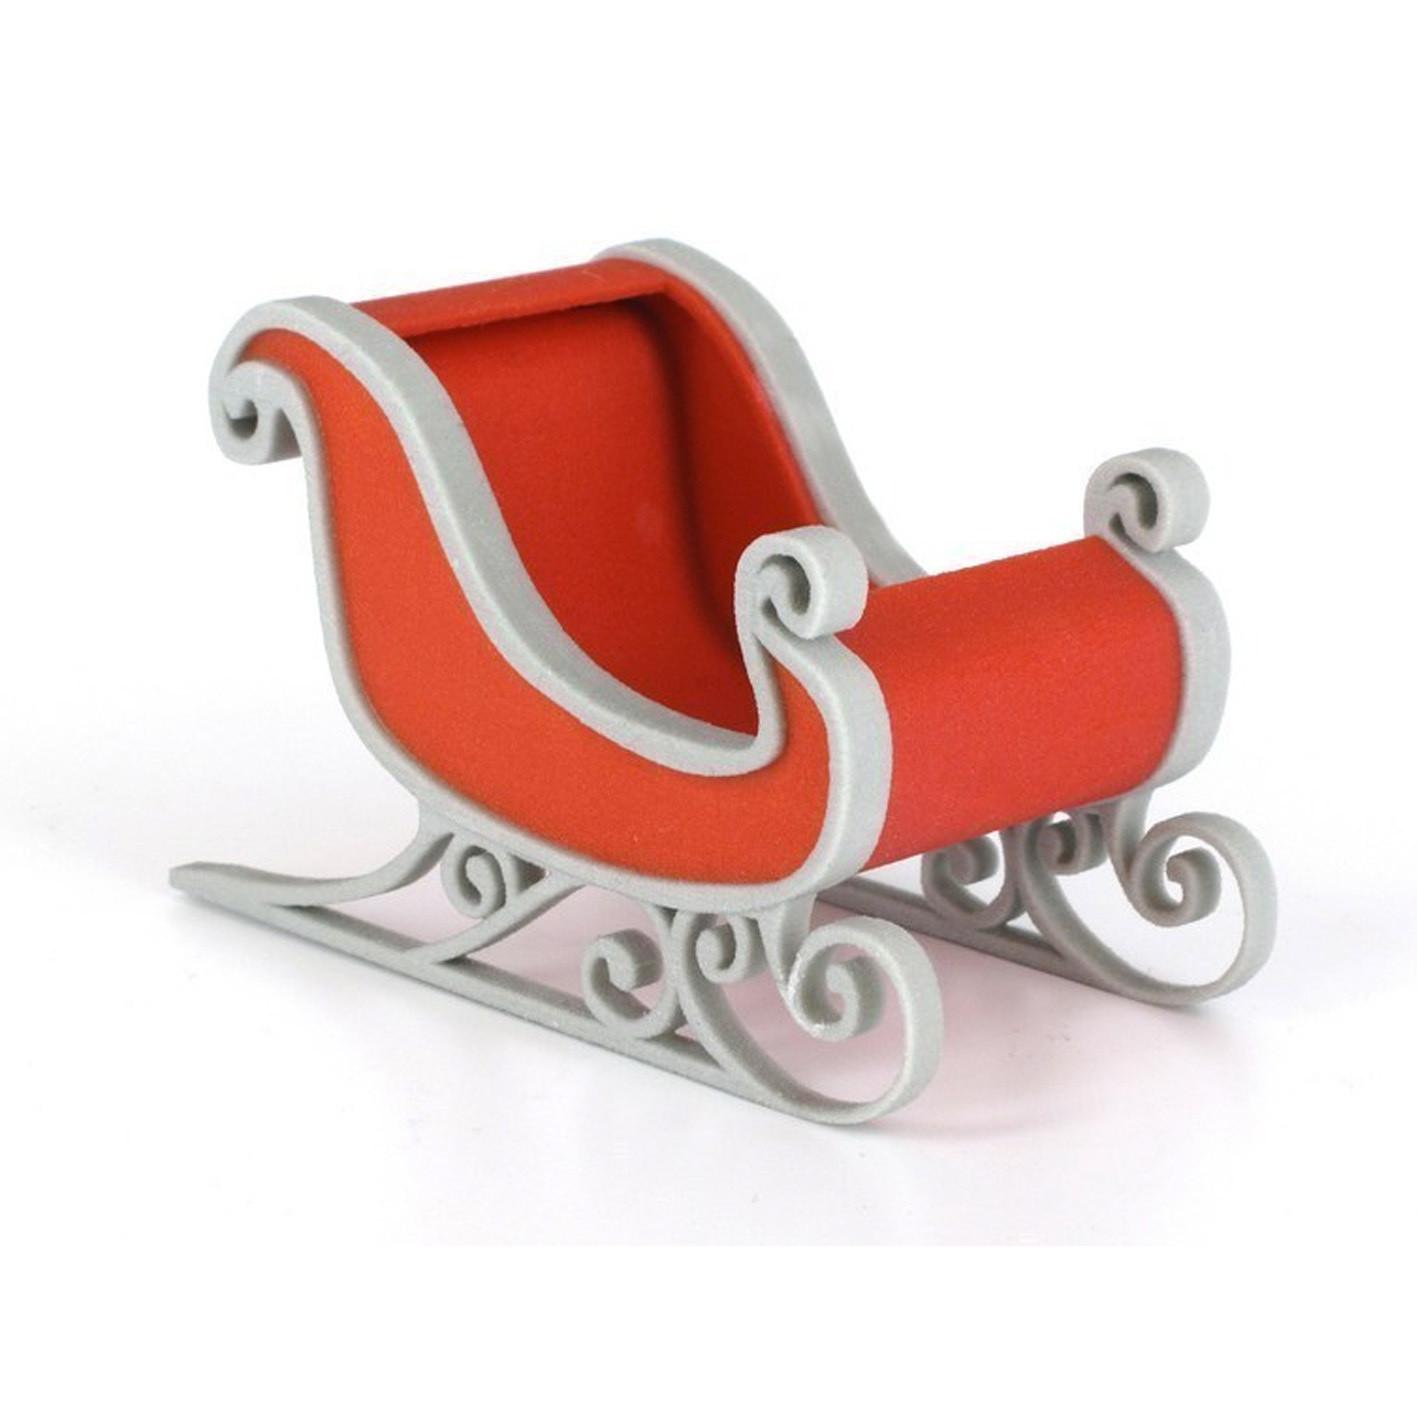 1.jpg Download free STL file Santa's sleigh • 3D print design, CreativeTools